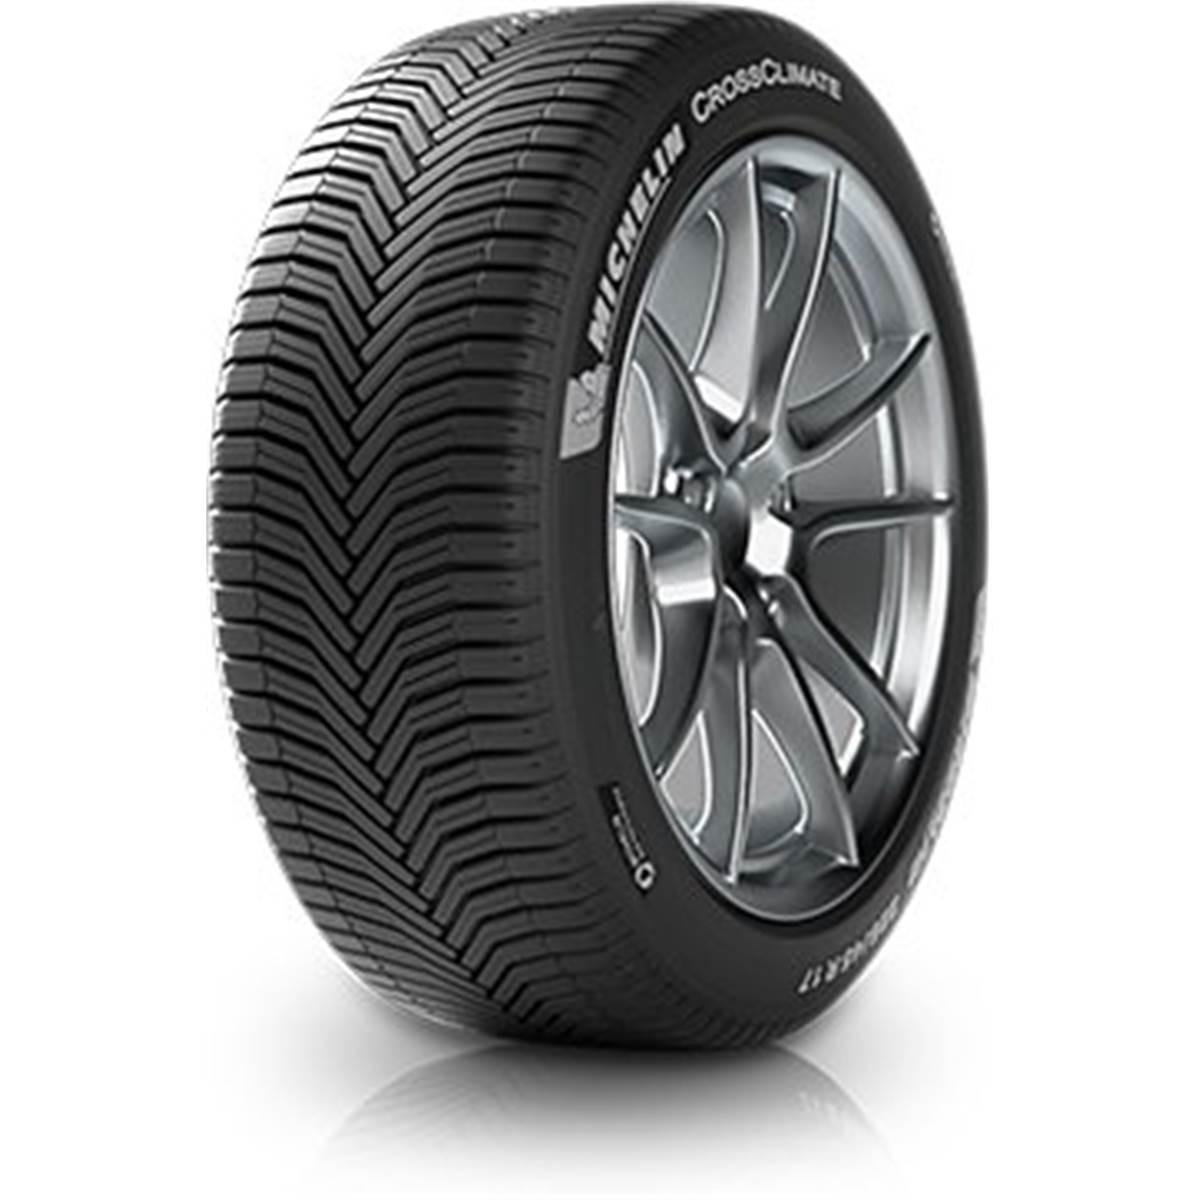 Pneu 4 Saisons Michelin 185/60R15 88V Cross Climate XL